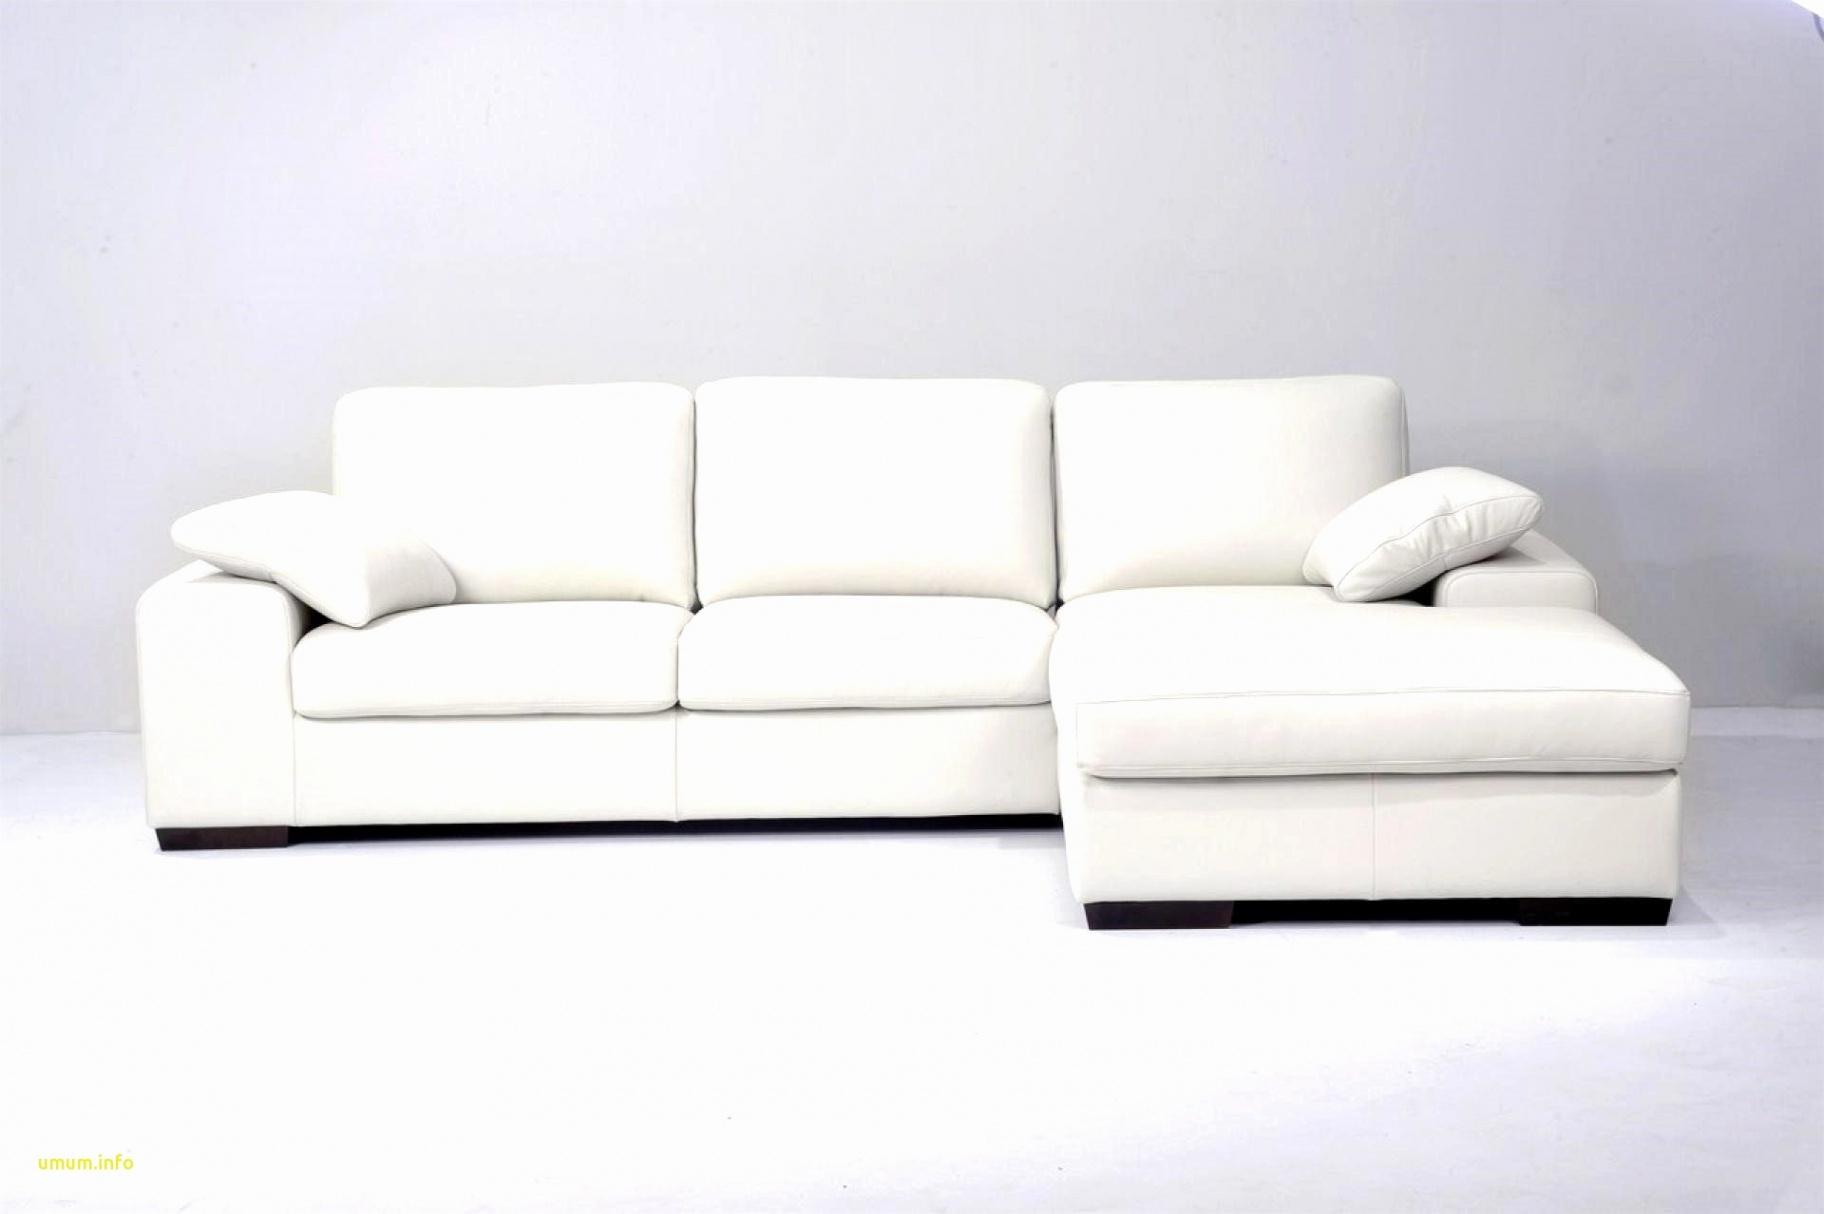 Canapé D Angle Ikea Convertible Impressionnant Stock Canapé 3 Places Cuir — Laguerredesmots